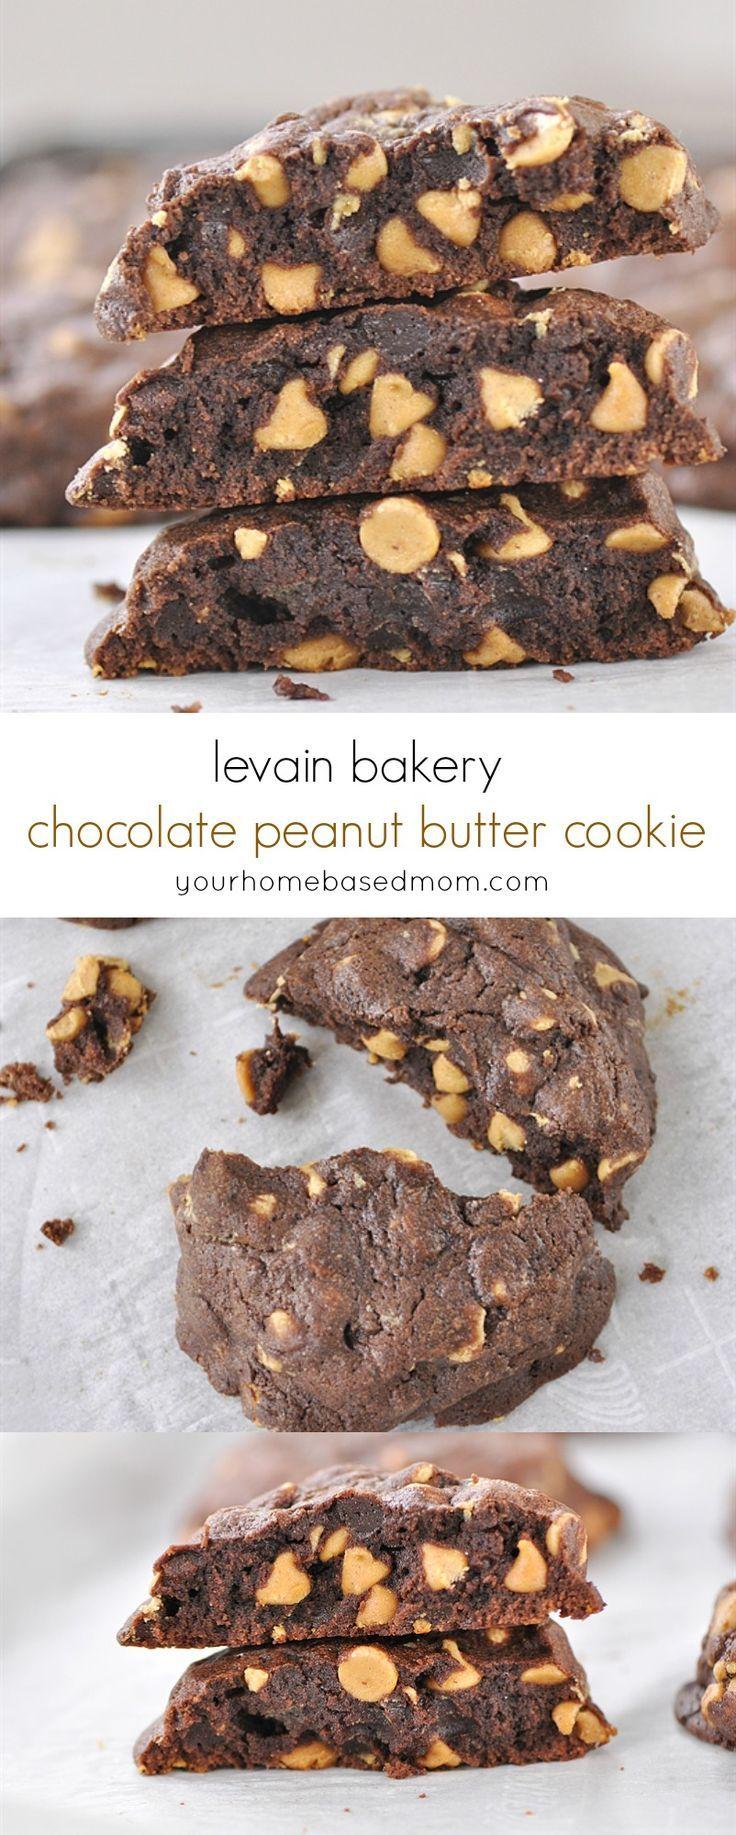 Levain Bakery Chocolate Peanut Butter Cookie